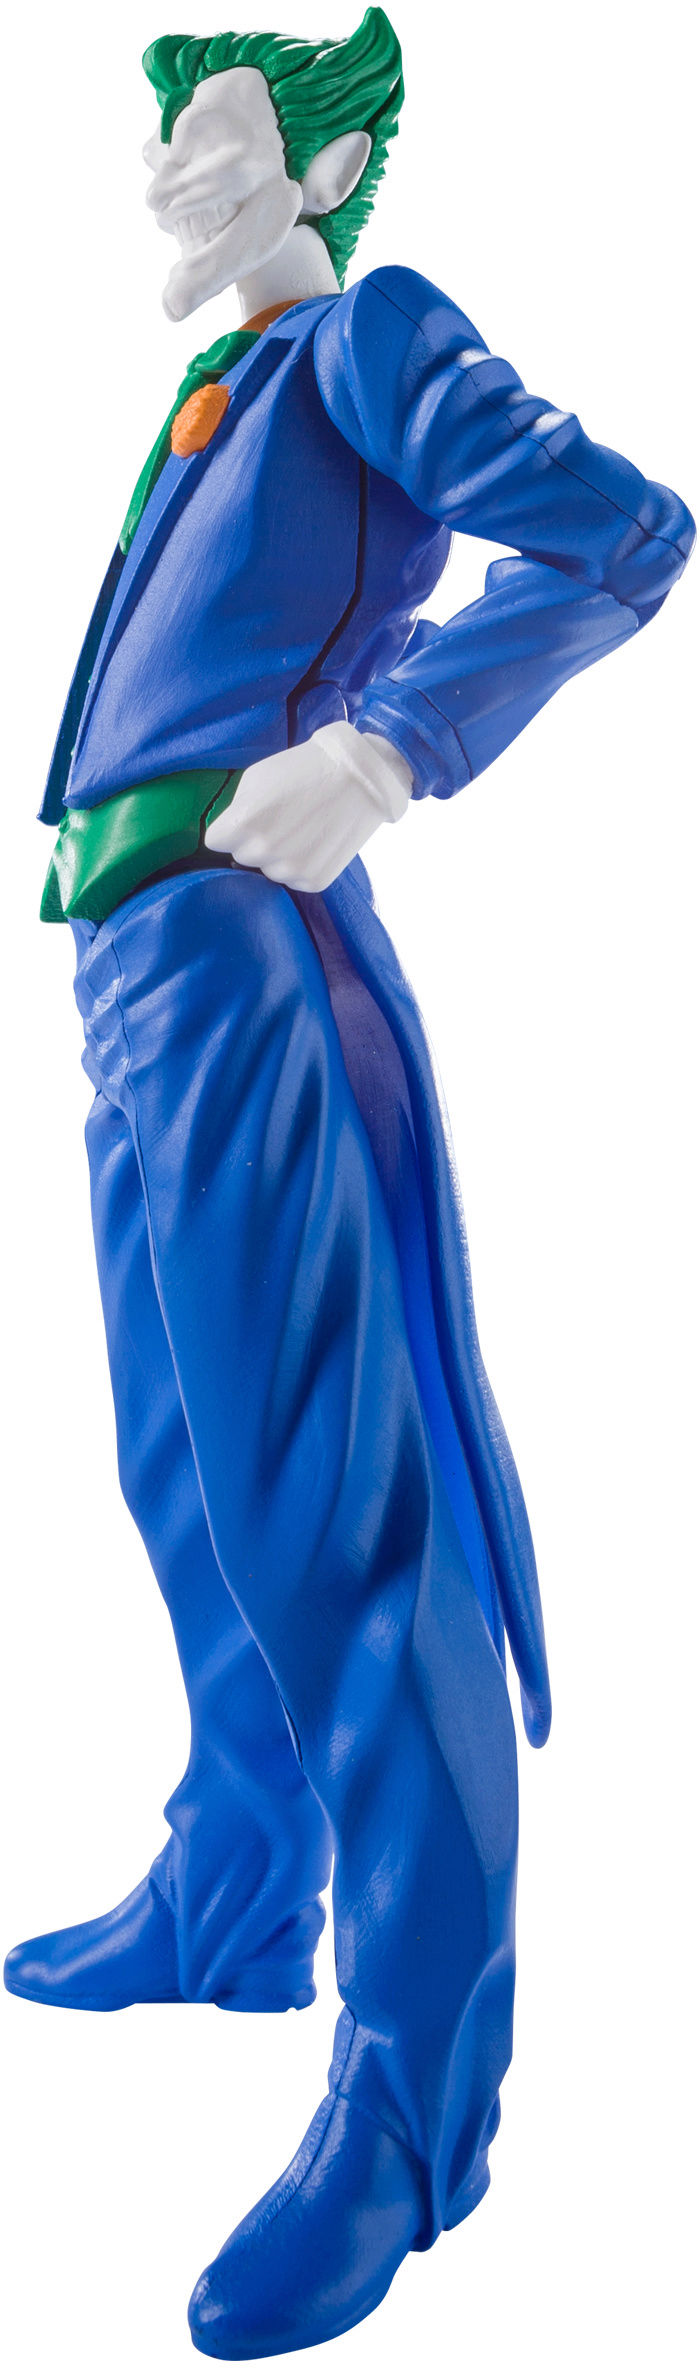 Original Comic The Joker - Level 1 (Sprukits-Bandai) Joker-12